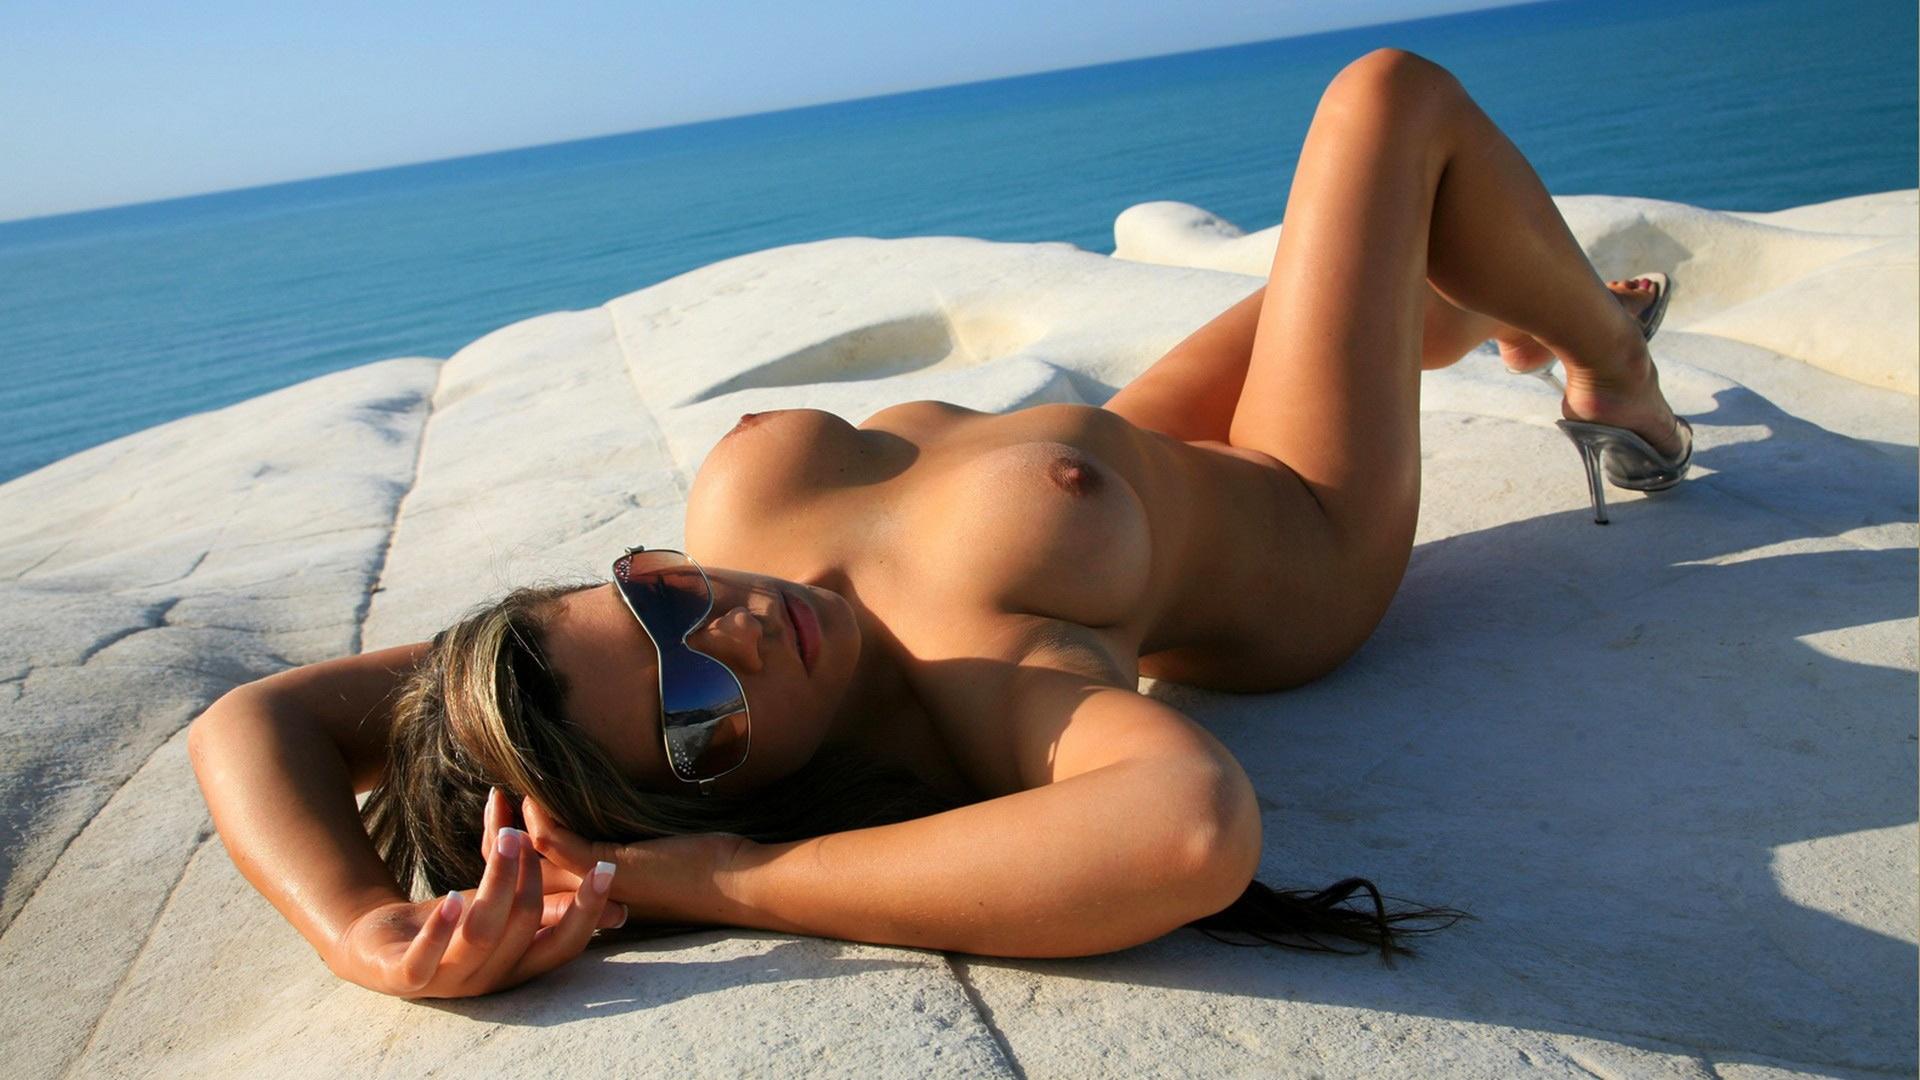 girl sunglasses beach Nude